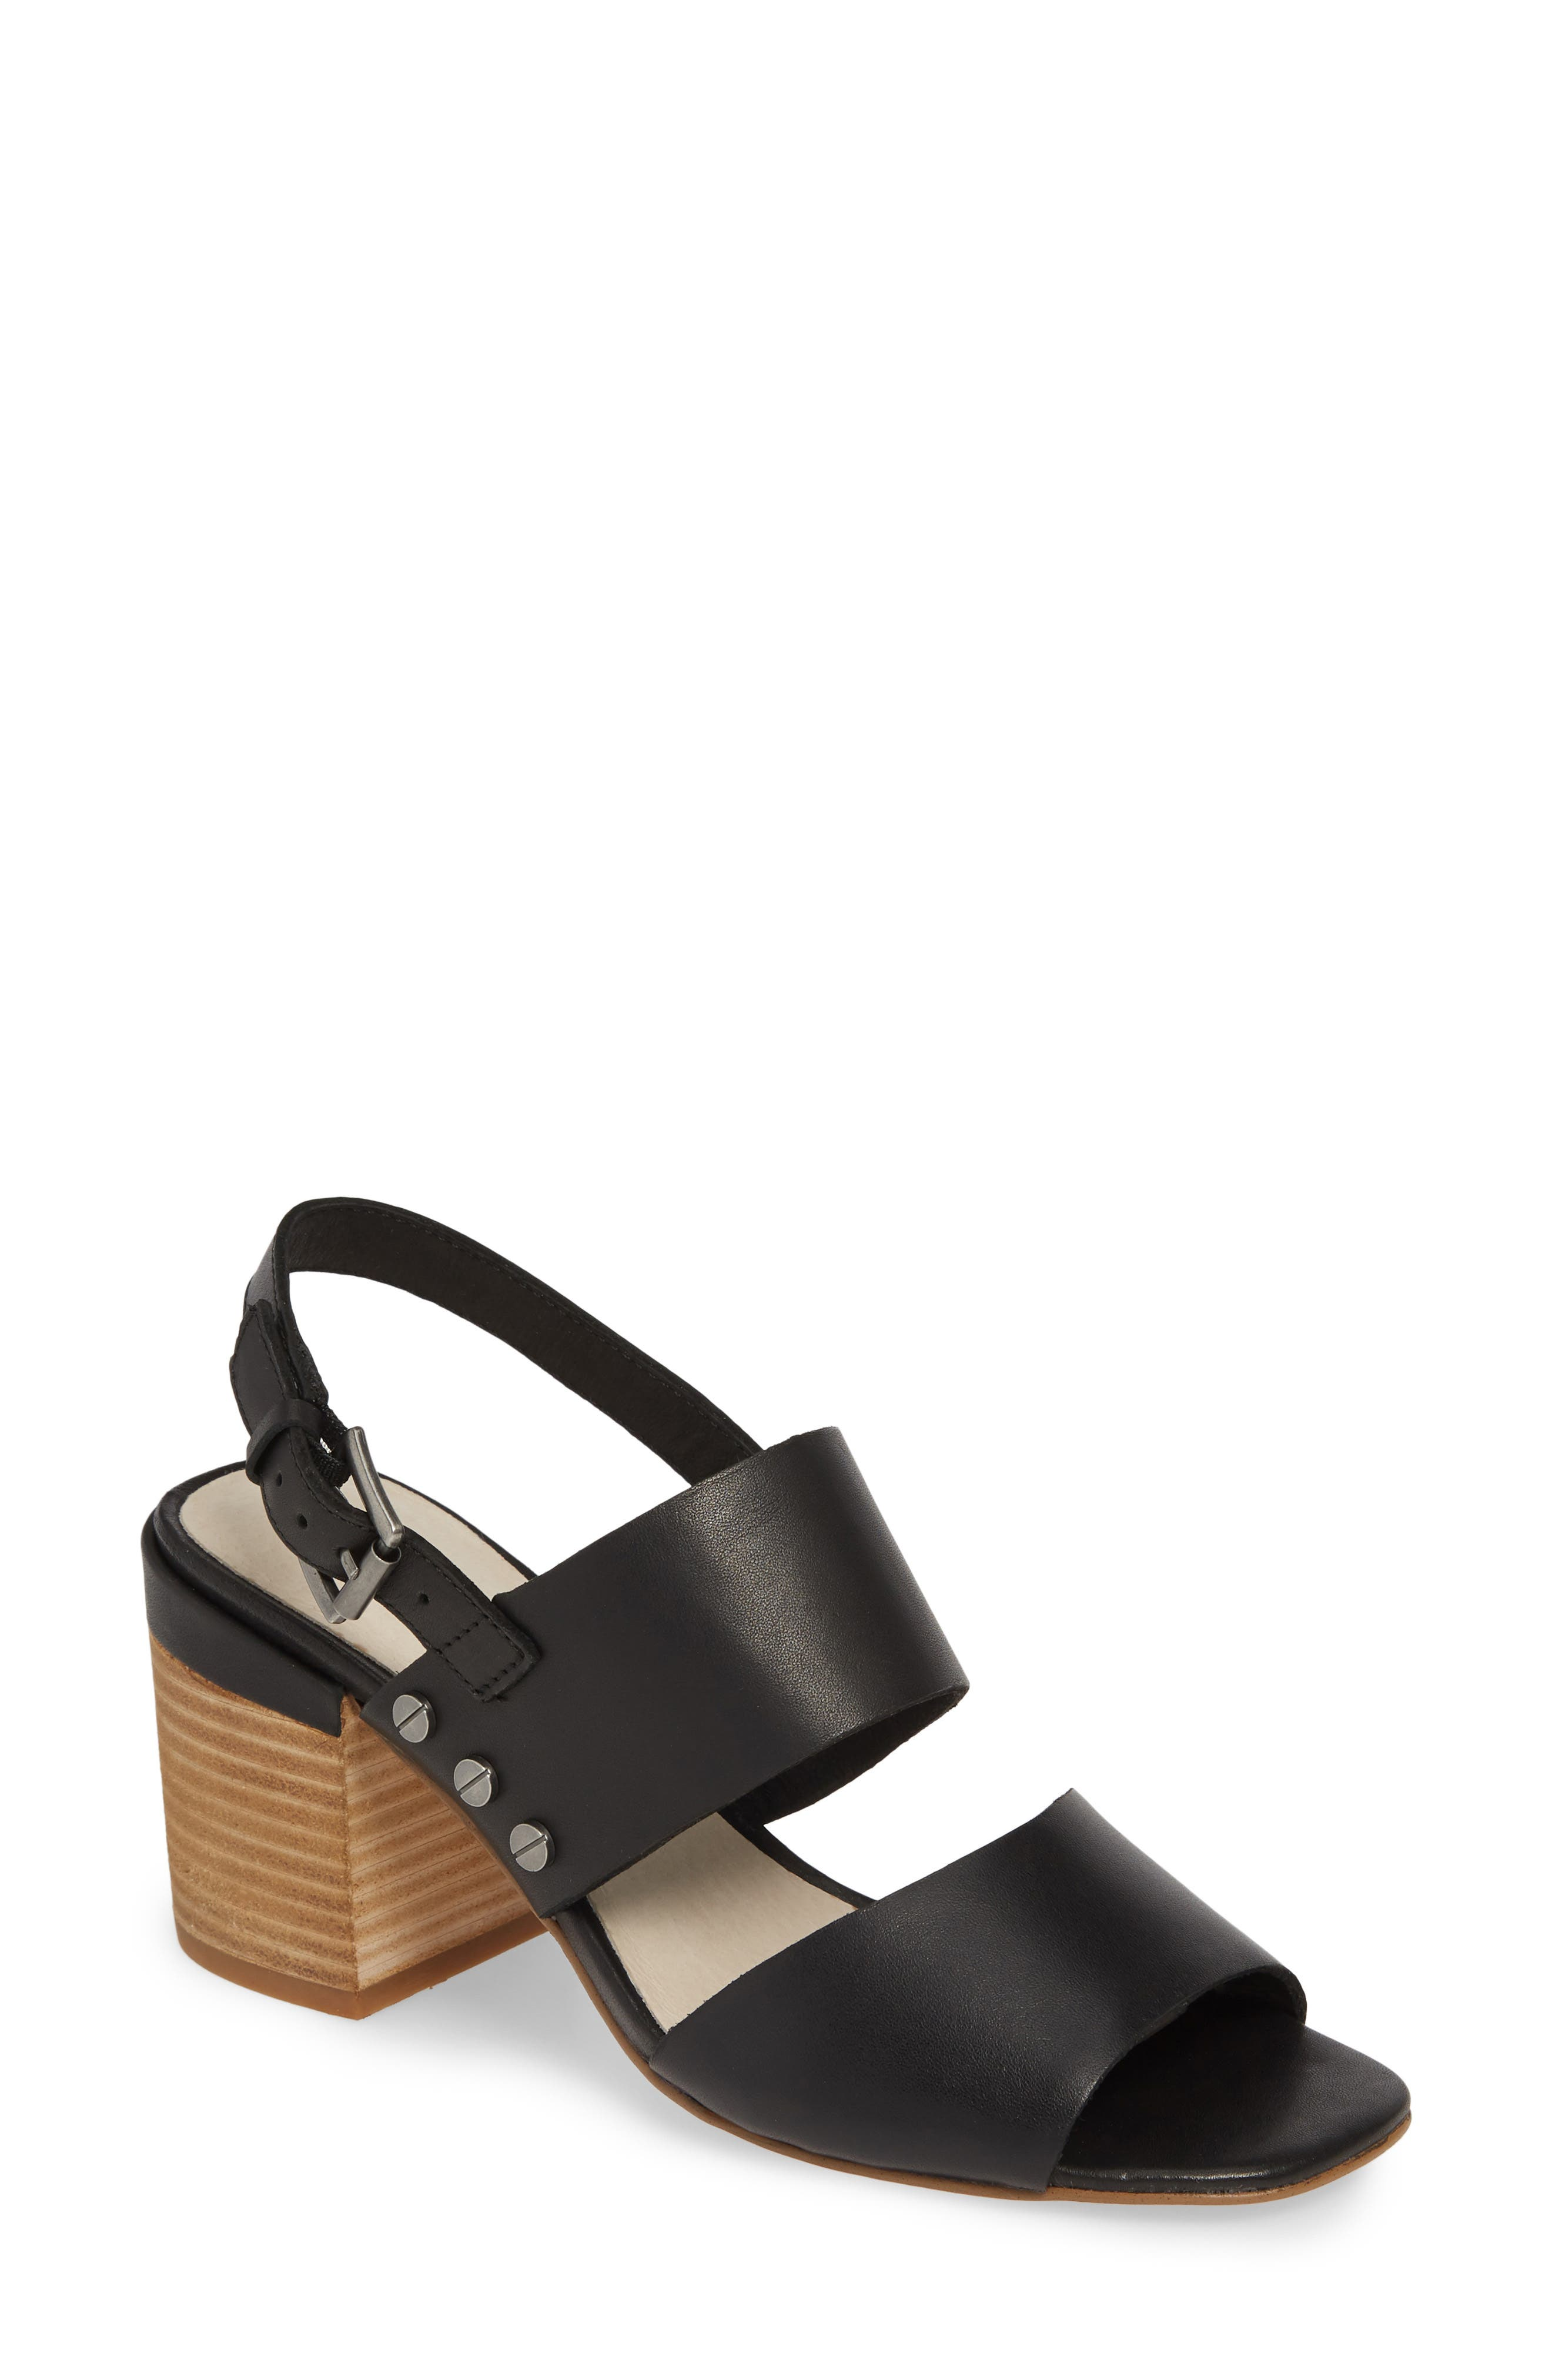 CASLON<SUP>®</SUP> Caslon Brayden Slingback Sandal, Main, color, BLACK LEATHER